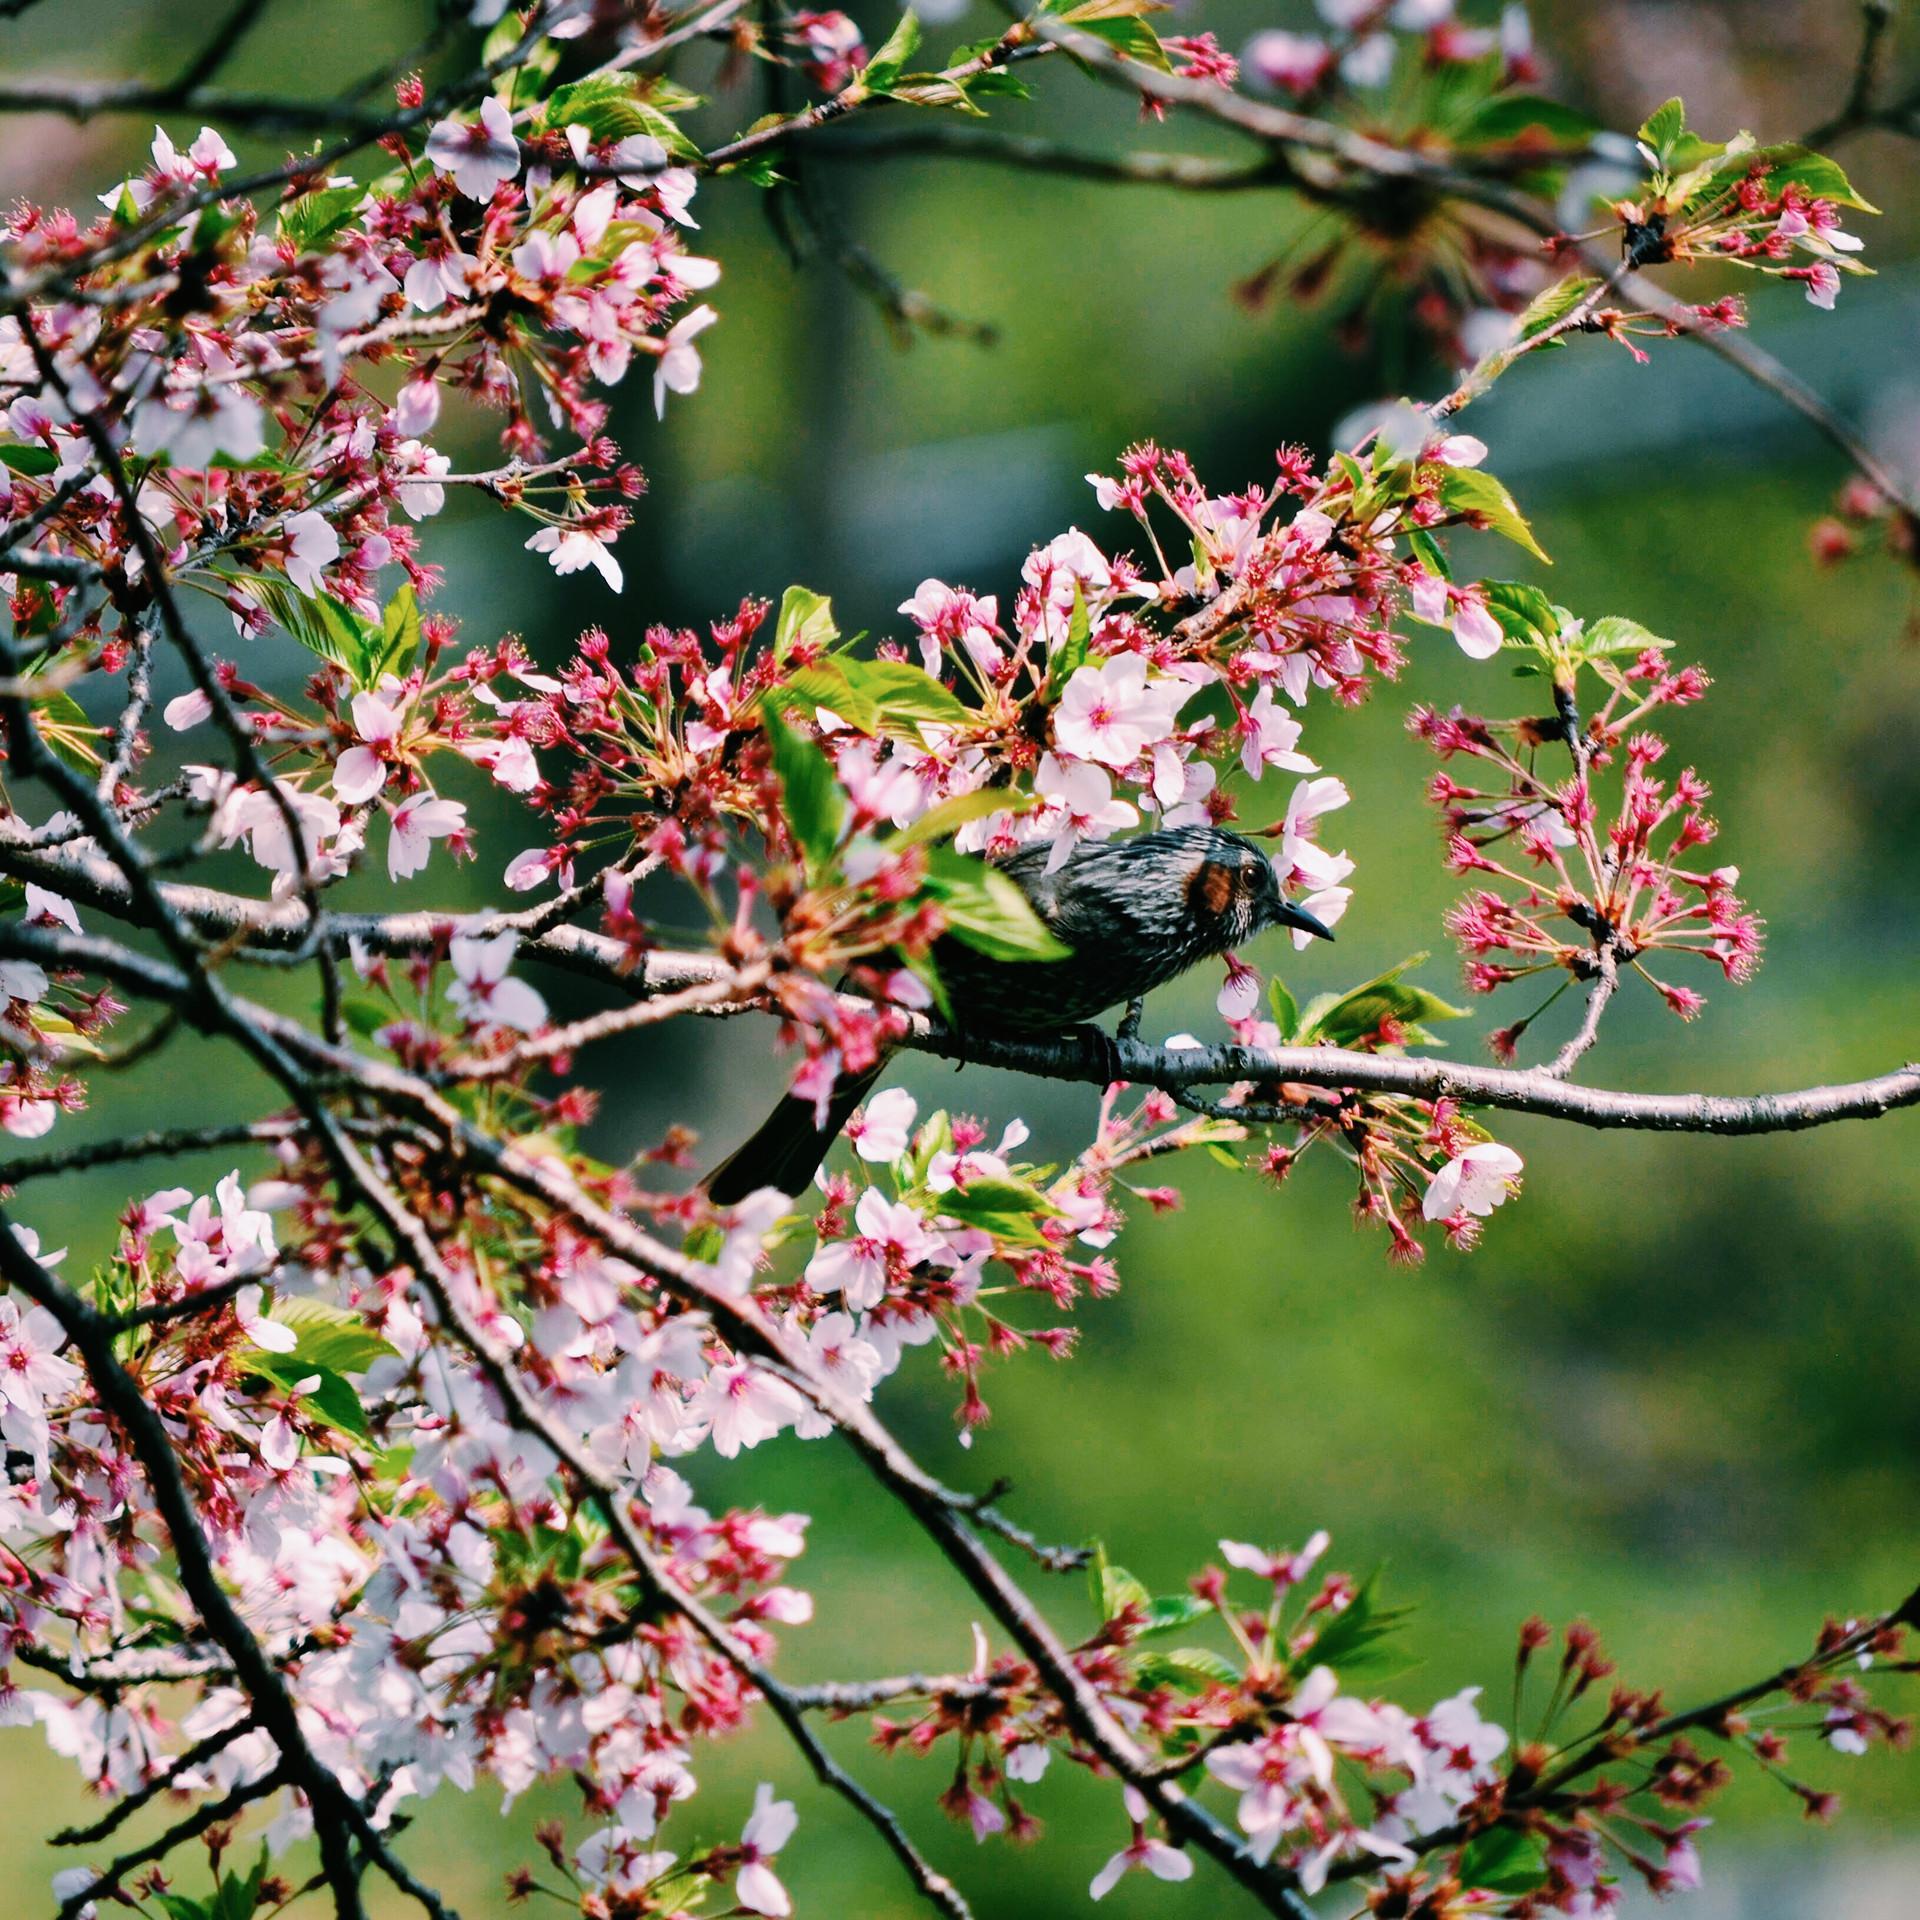 Bird in the cherry blossom.